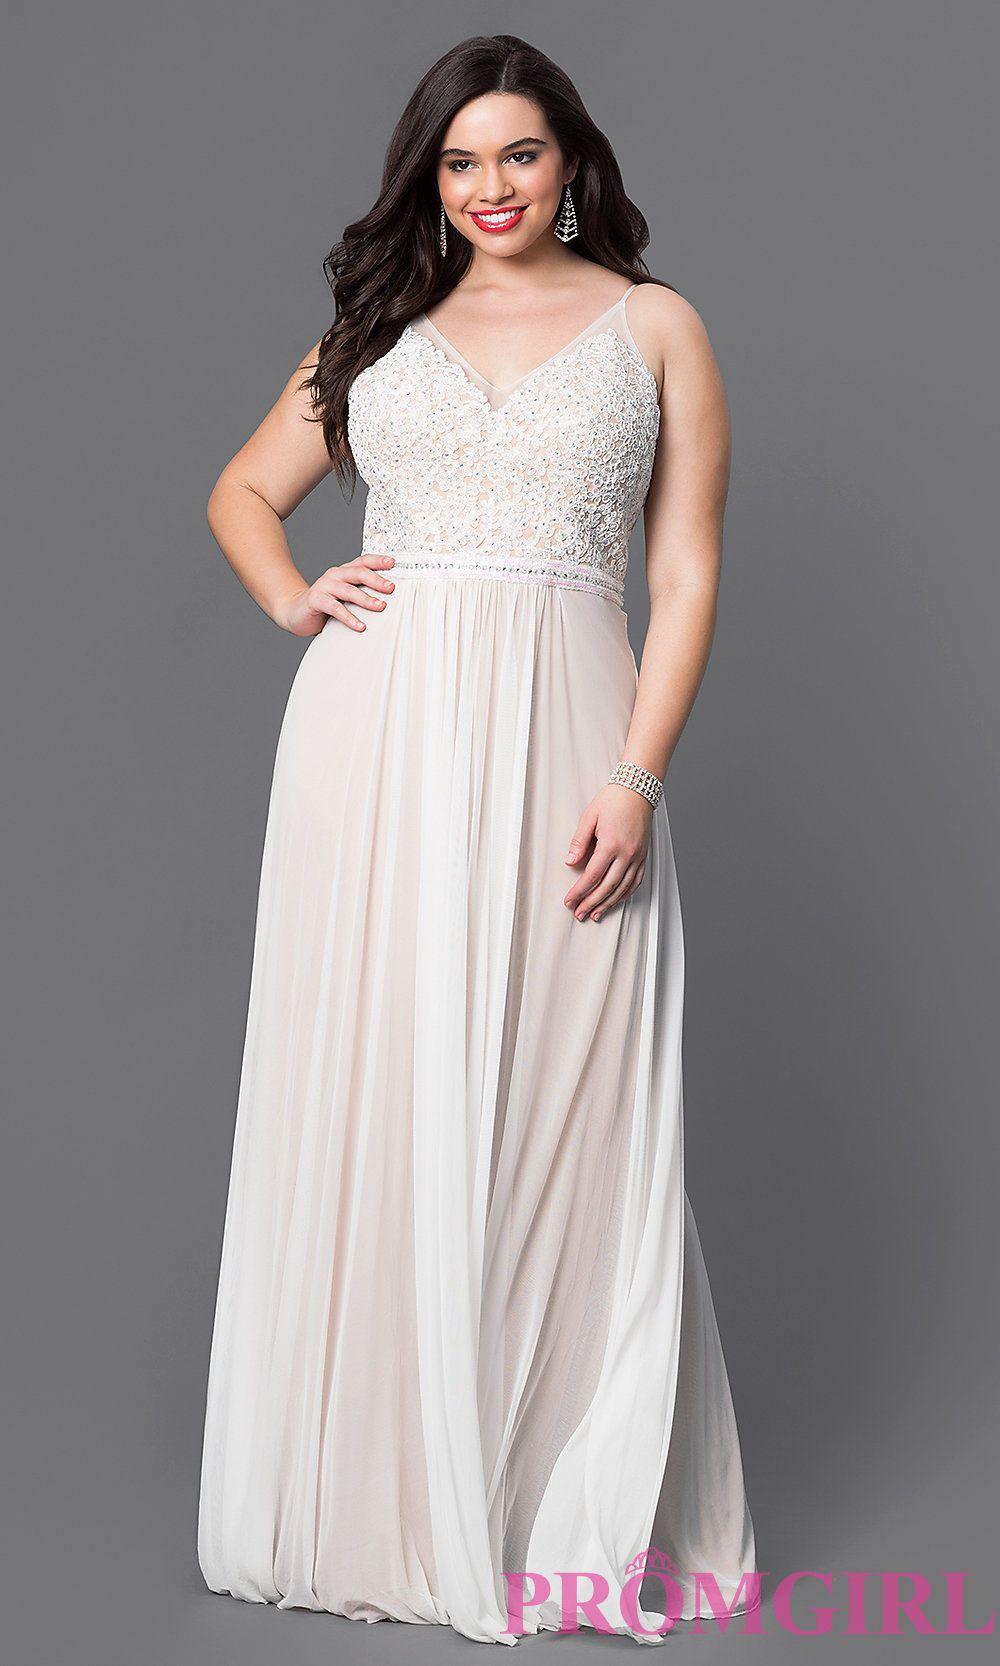 Ivory Plus Size Formal Dresses